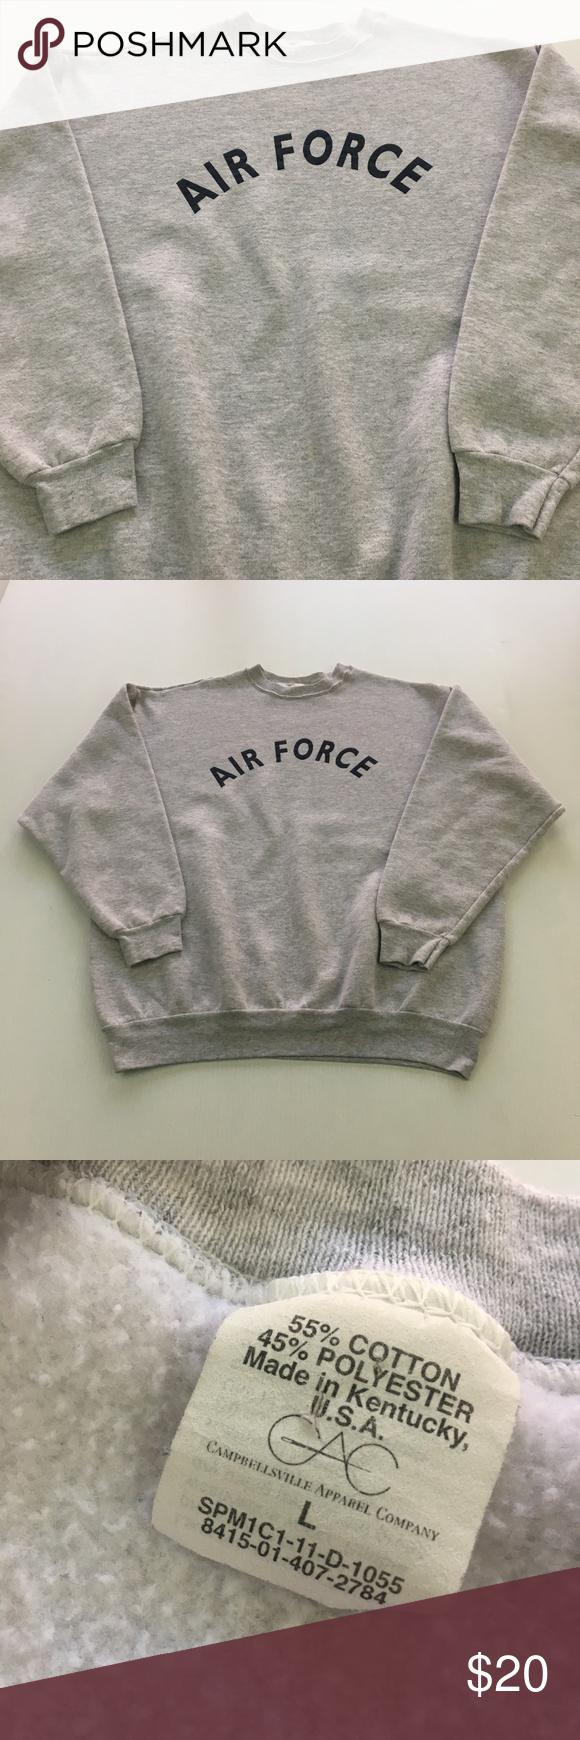 Vintage Air Force Sweatshirt Usa Gray L Crewneck Air Force Sweatshirt Vintage Air Sweatshirts [ 1740 x 580 Pixel ]